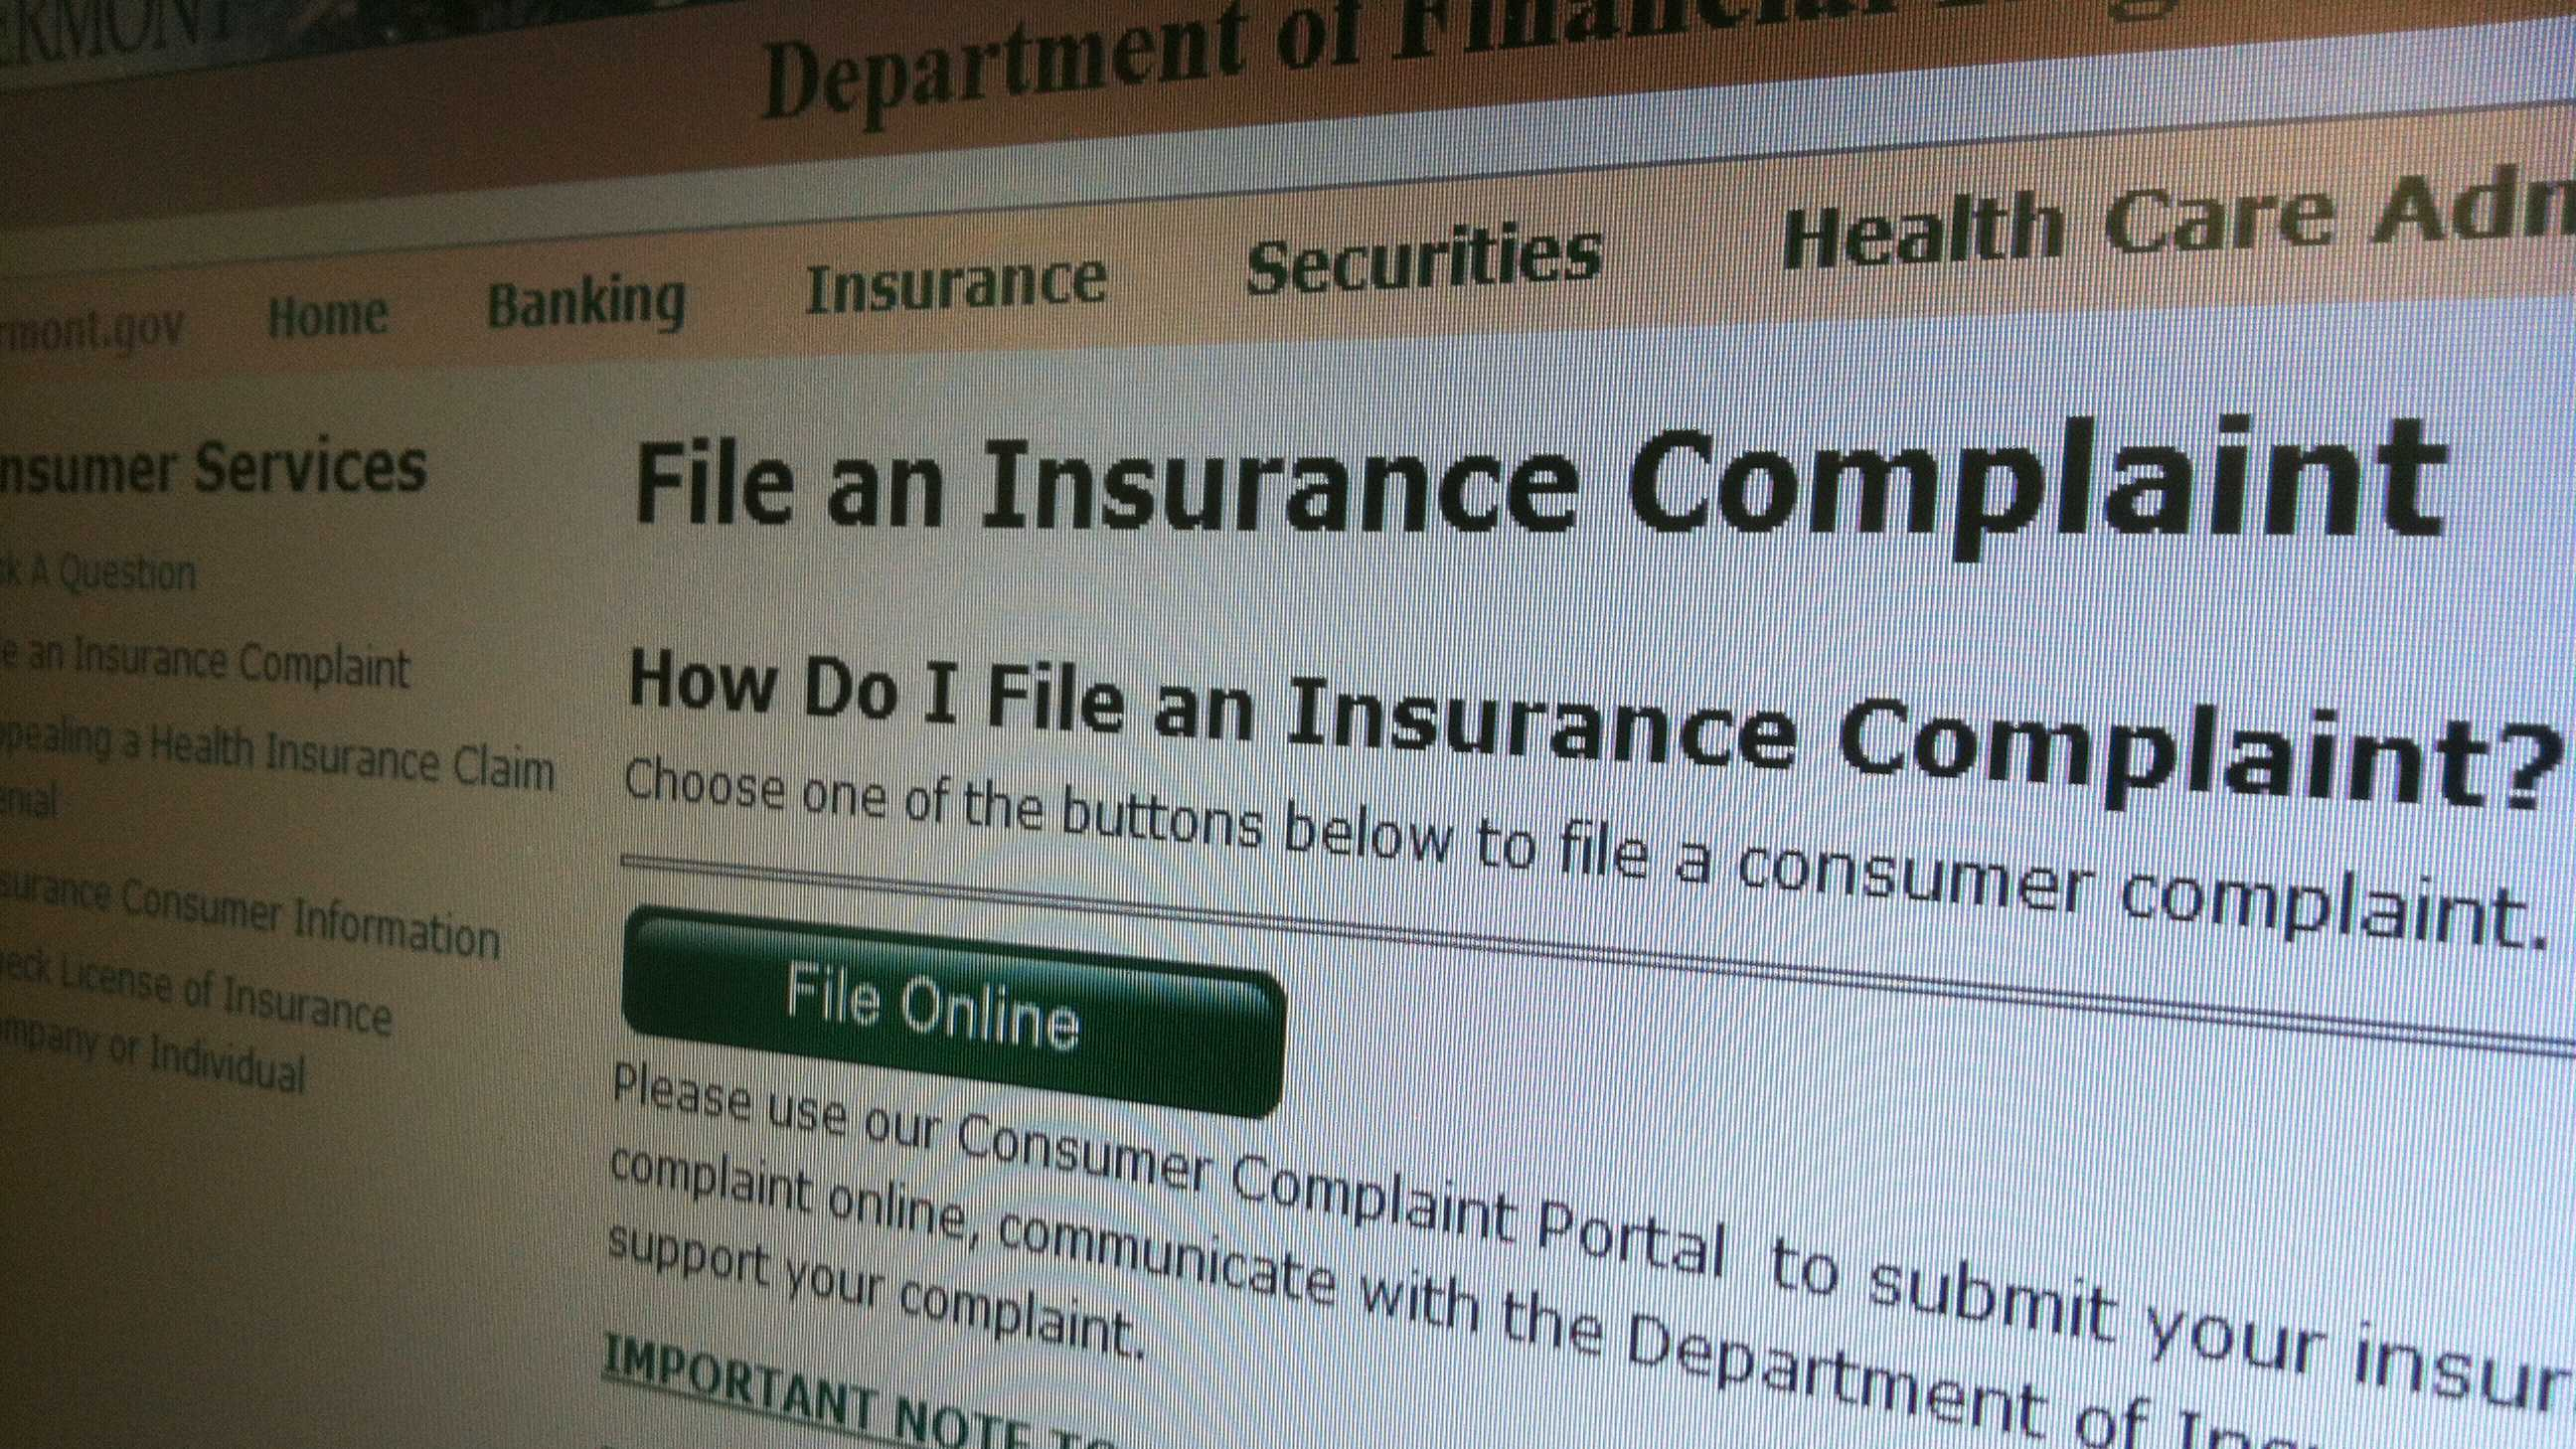 04-23-13 Online option to file Vt insurance complaints - img